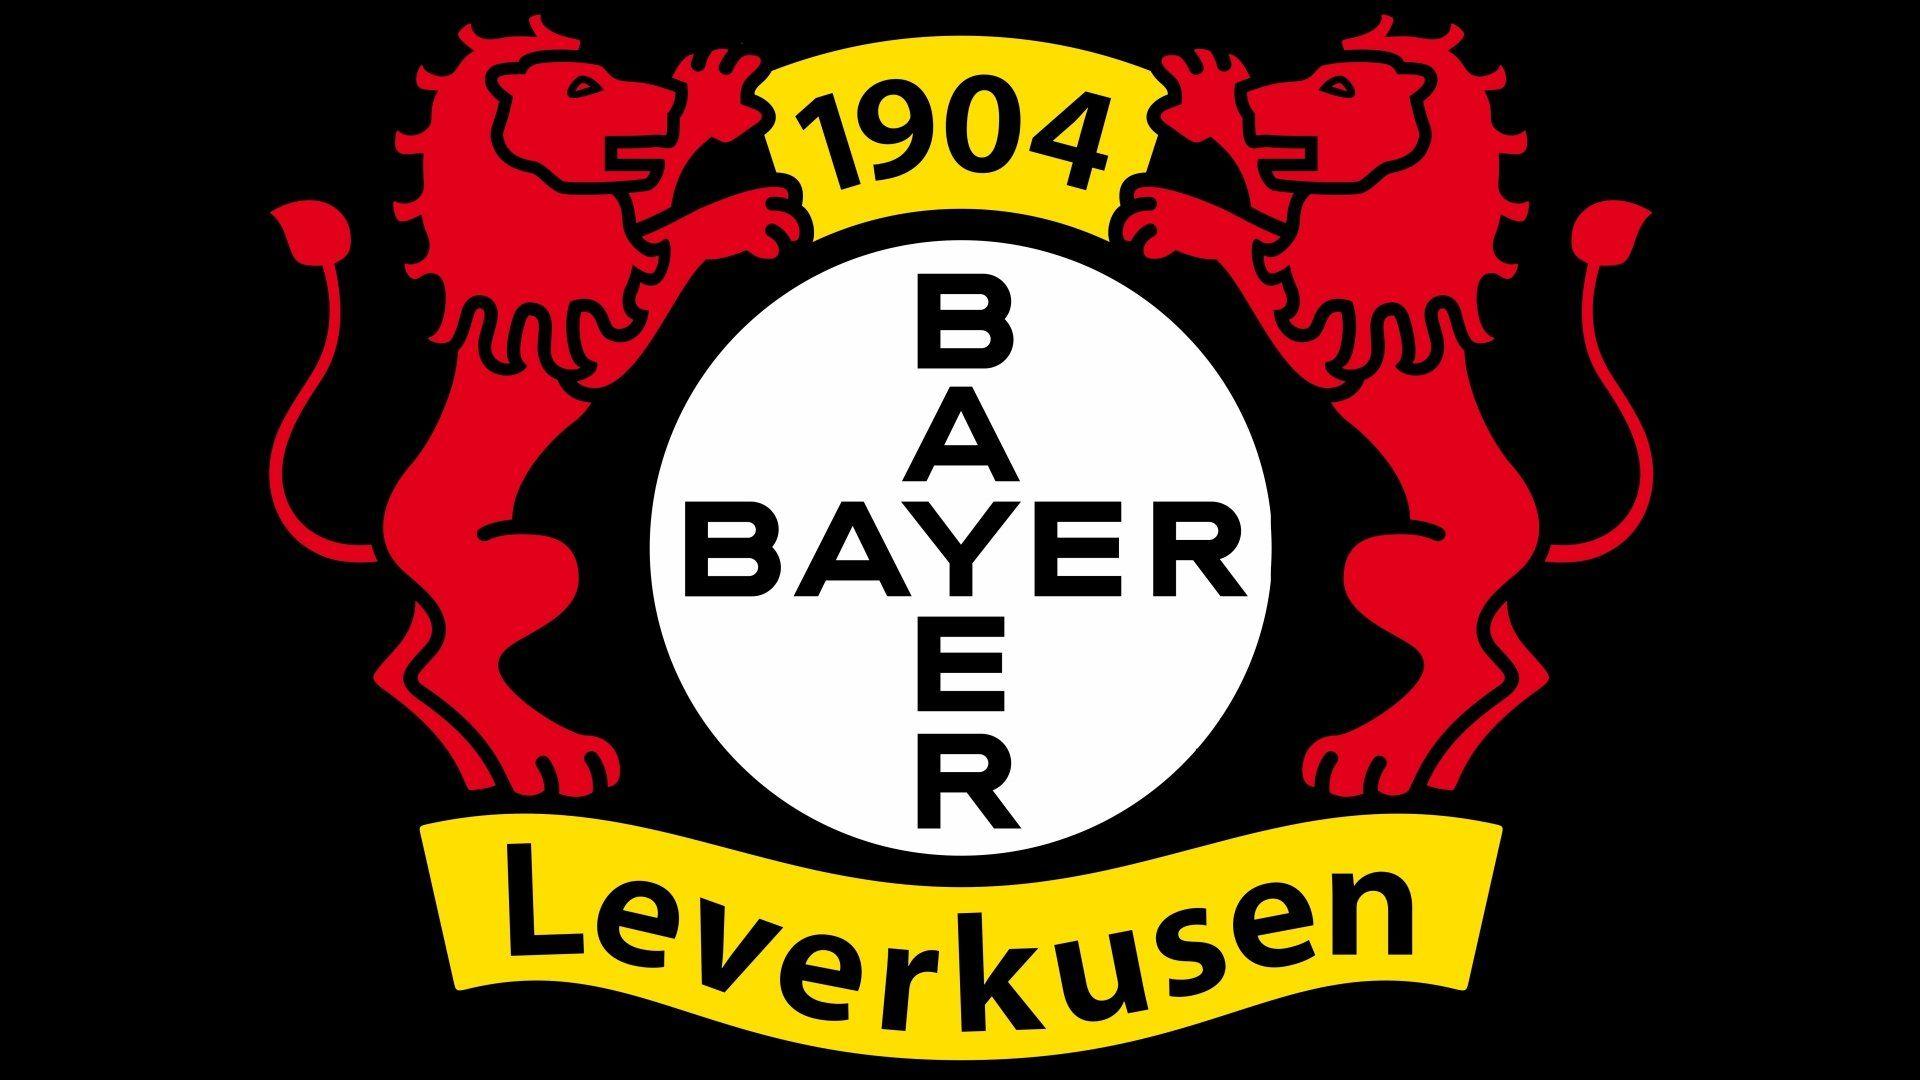 Bayer leverkusen logo clipart clipart freeuse library Leverkusen Logo - LogoDix clipart freeuse library